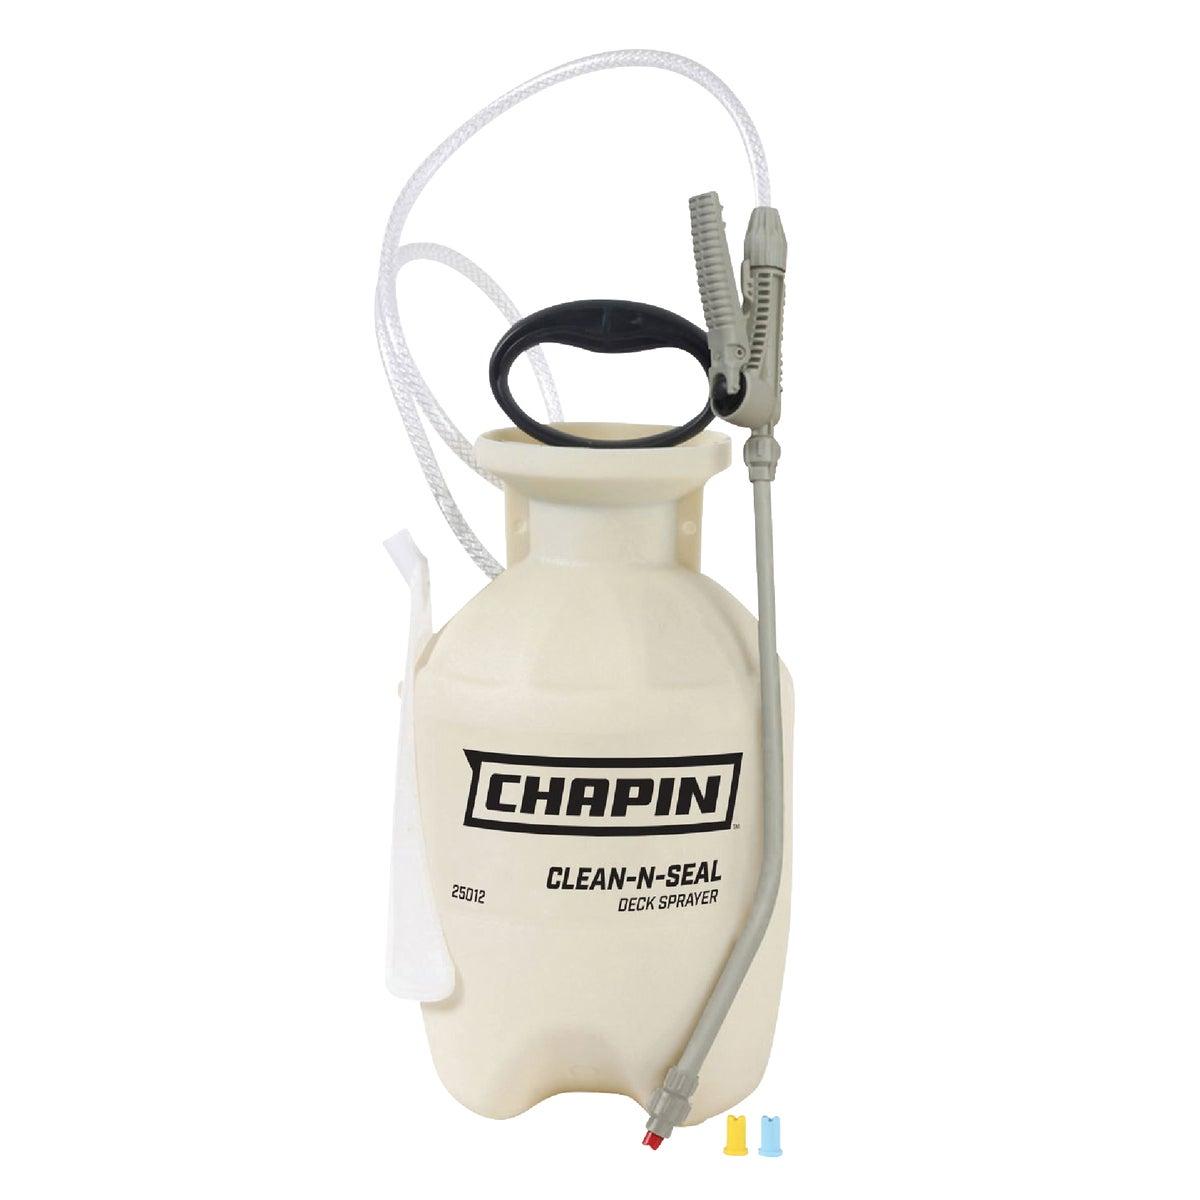 Chapin Clean-N-Seal SureSpray Deck Sprayer, 25012